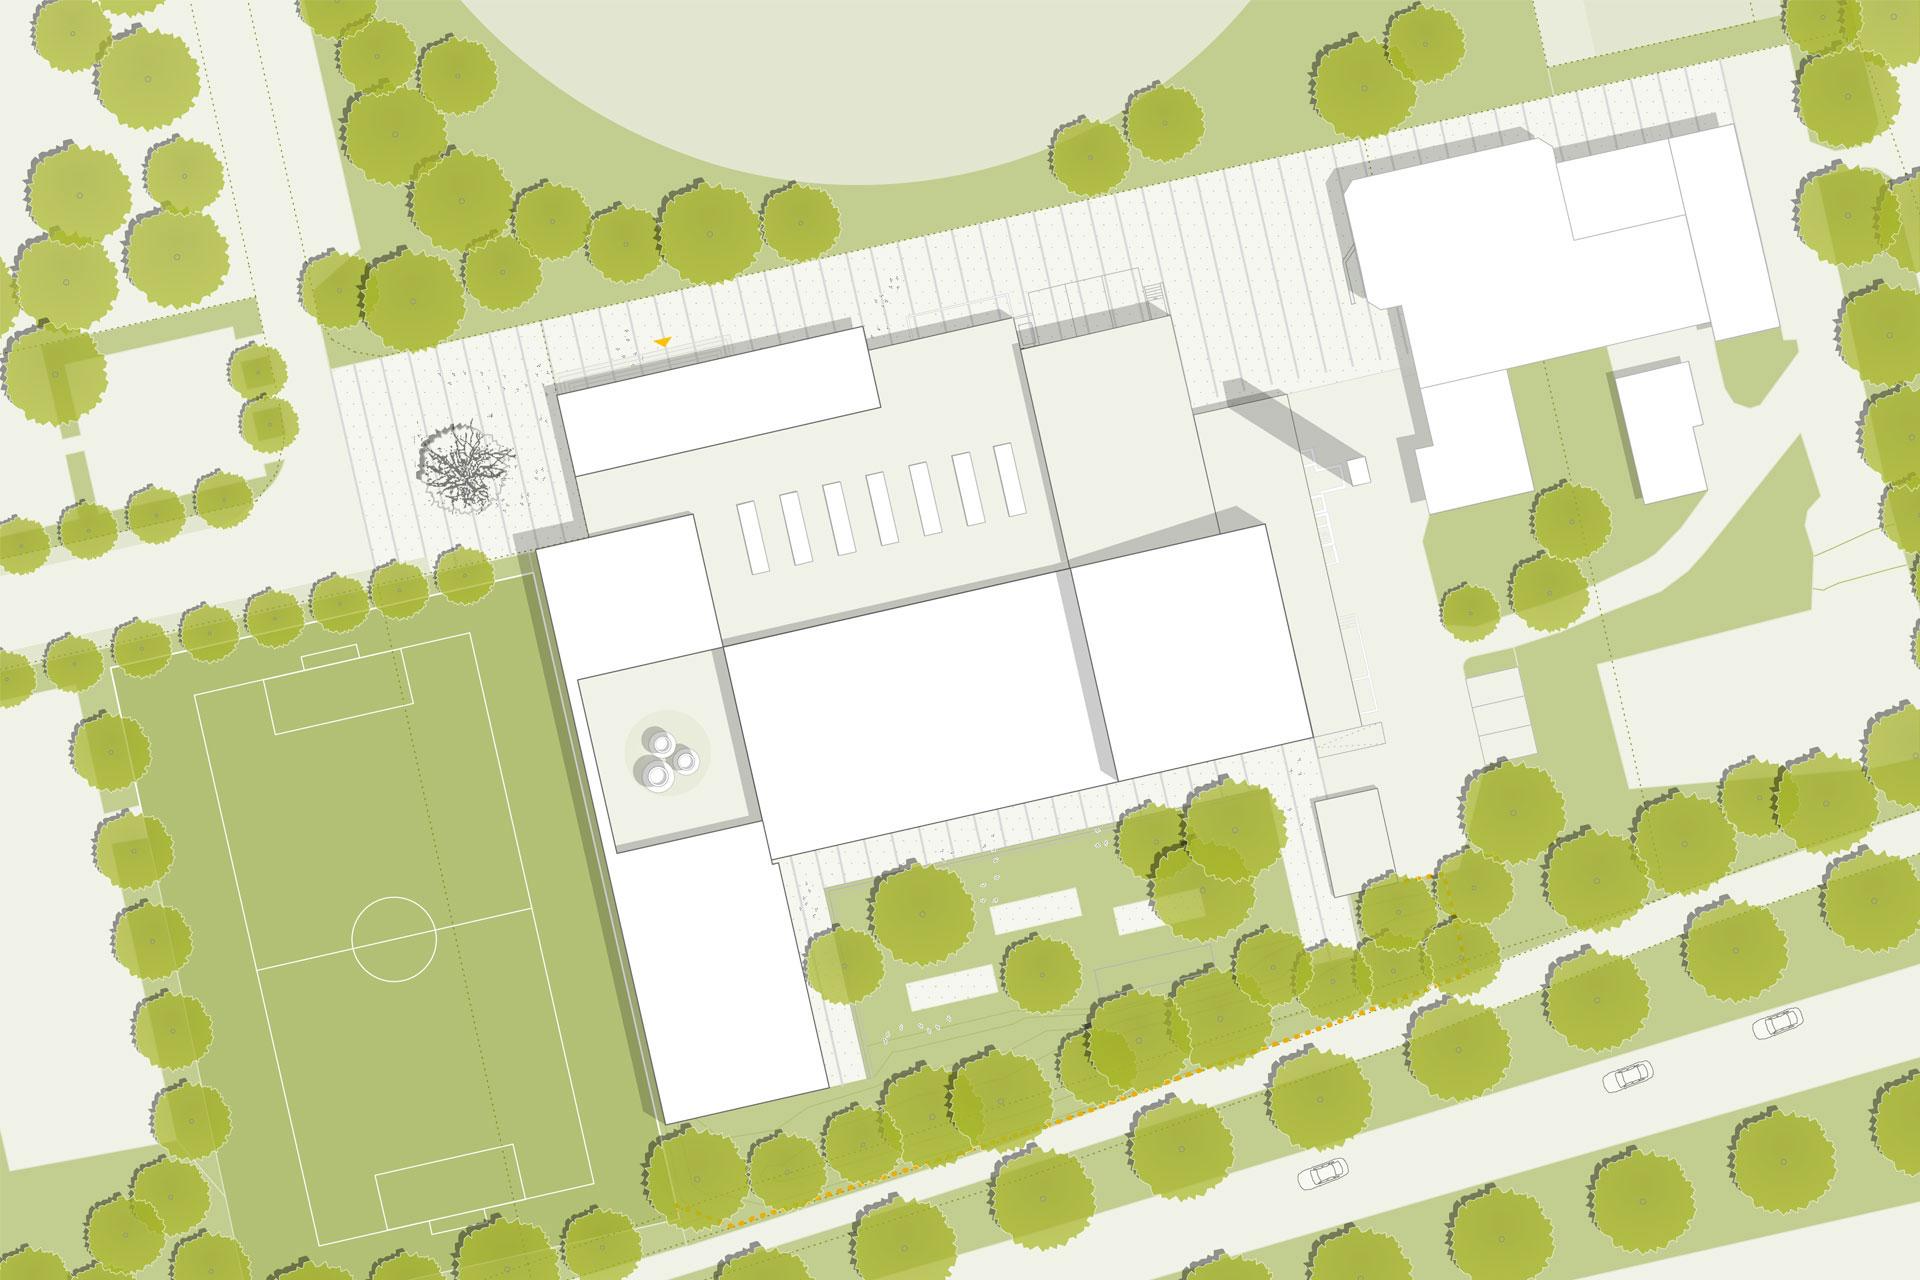 Hallenbad Germering Lageplan